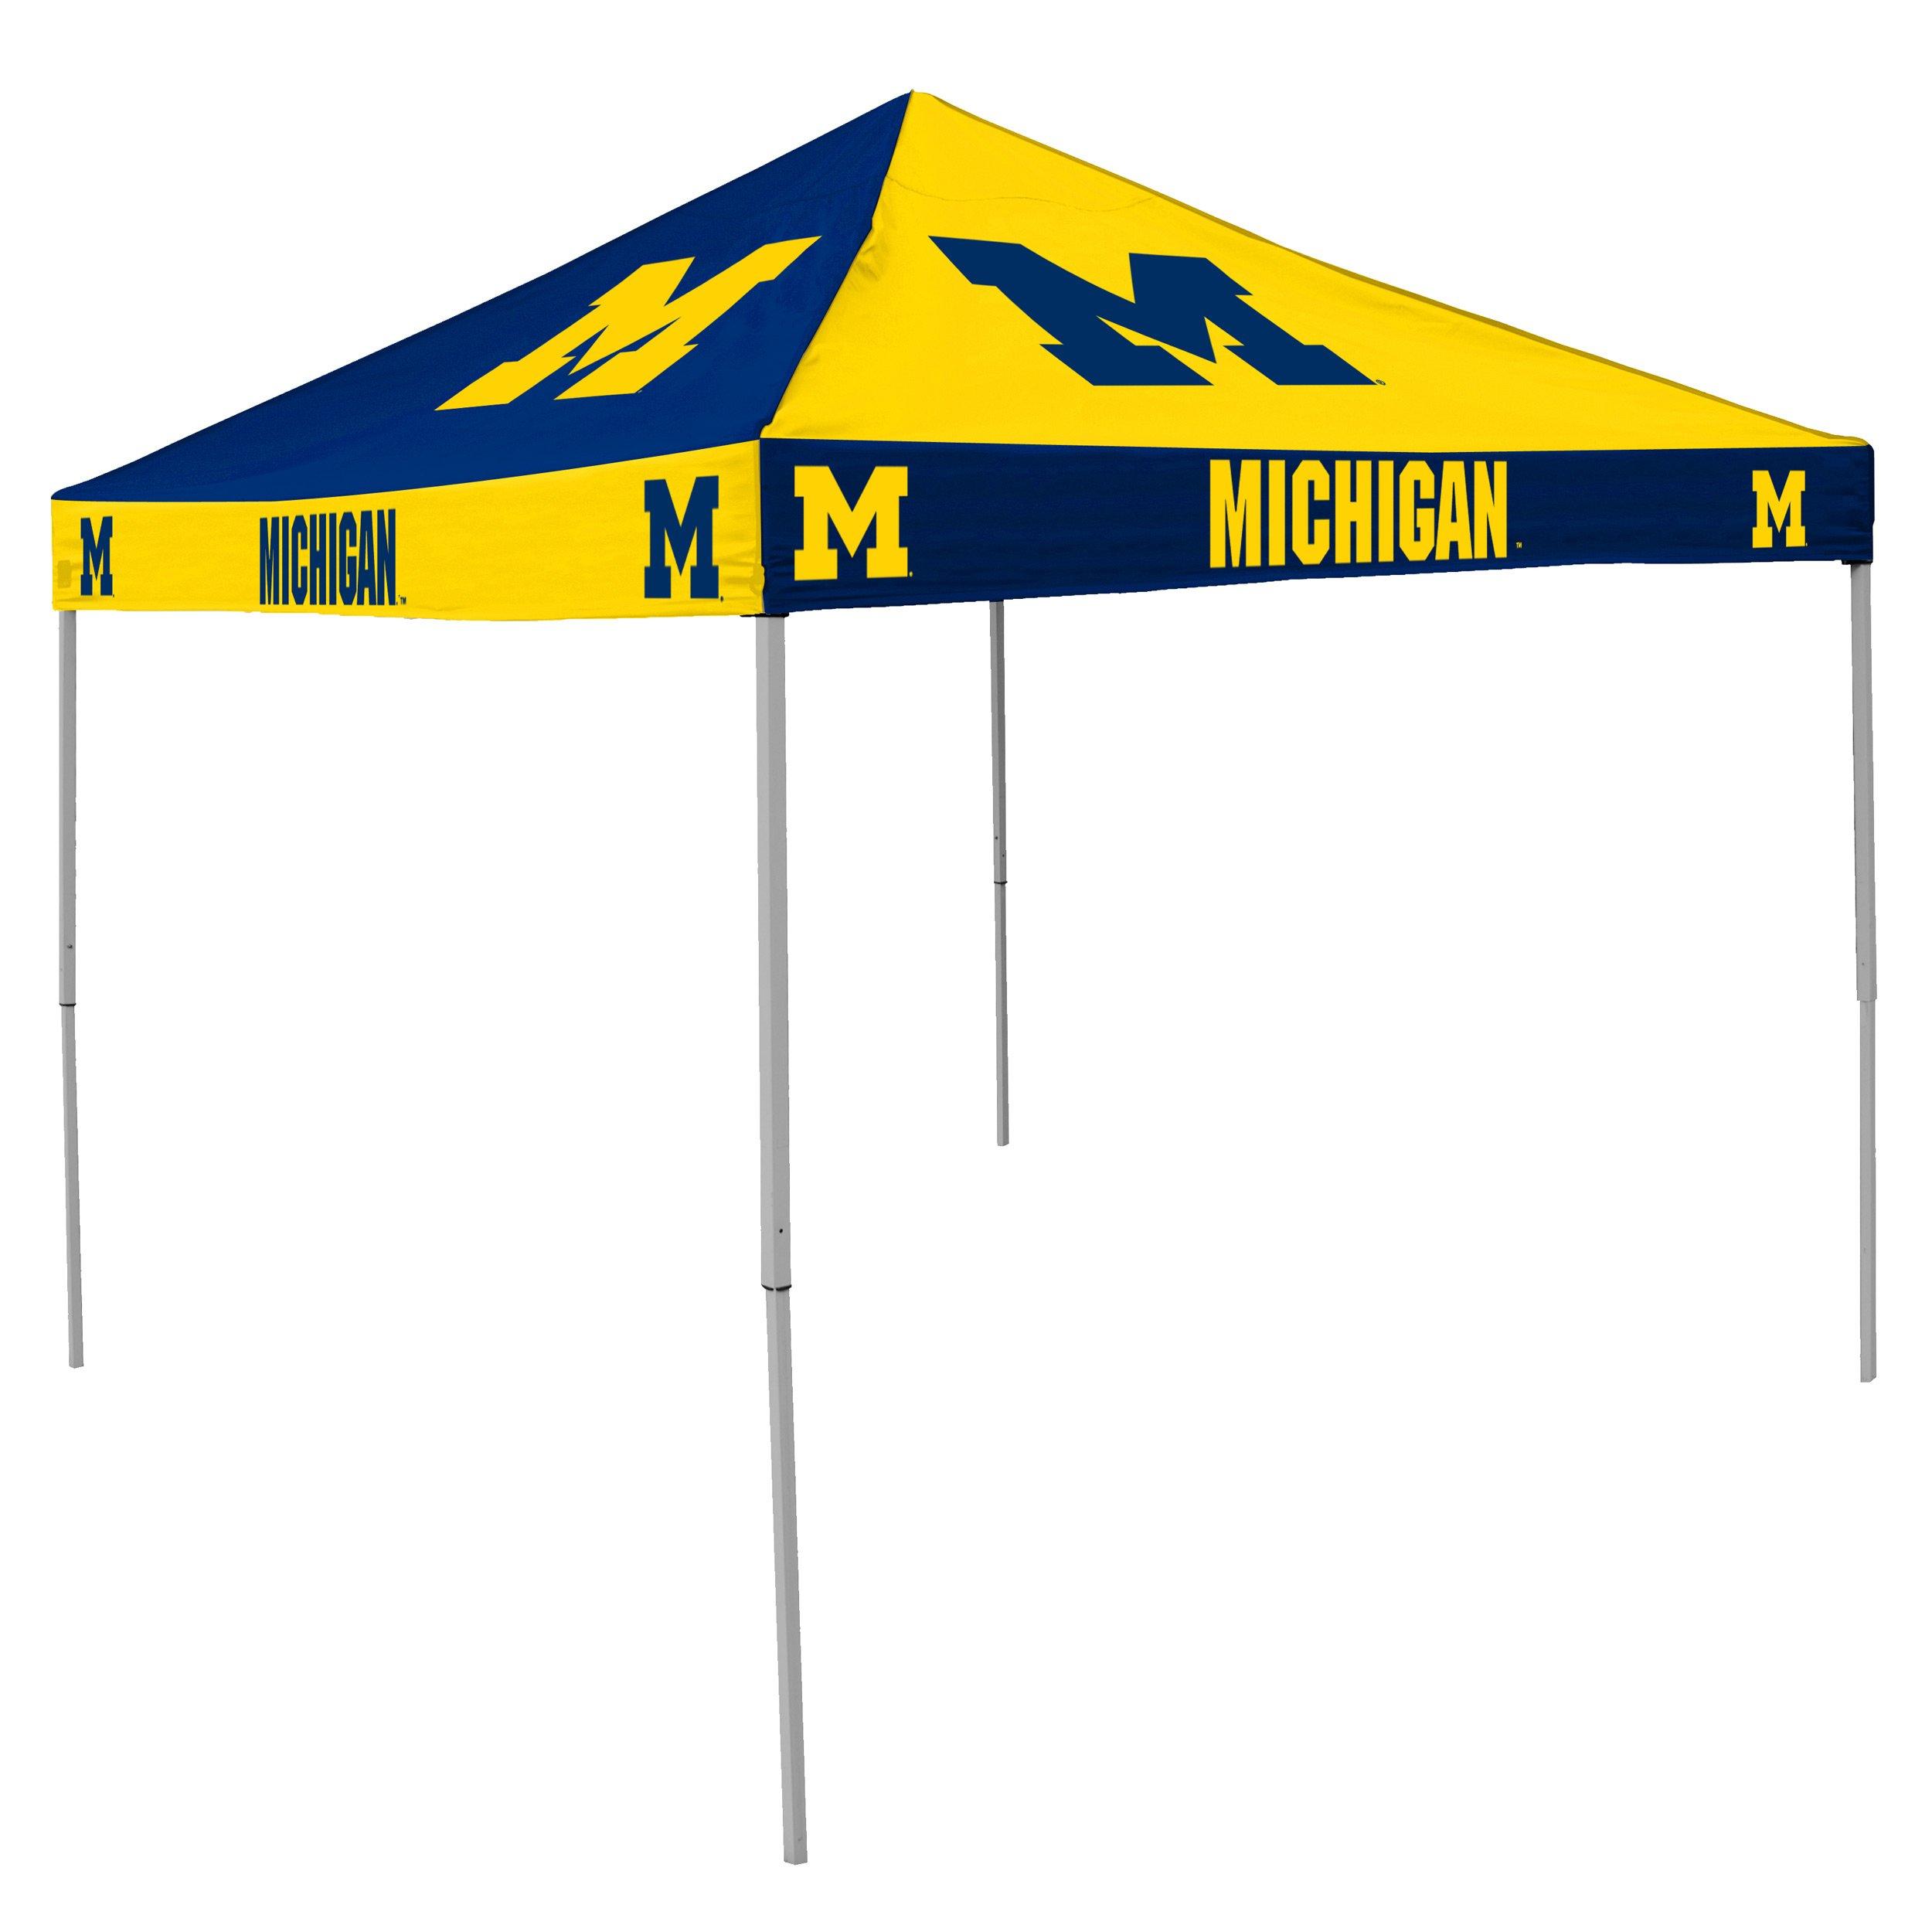 NCAA Michigan Wolverines 9-Foot x 9-Foot Pinwheel Tailgating Canopy, Navy/yellow